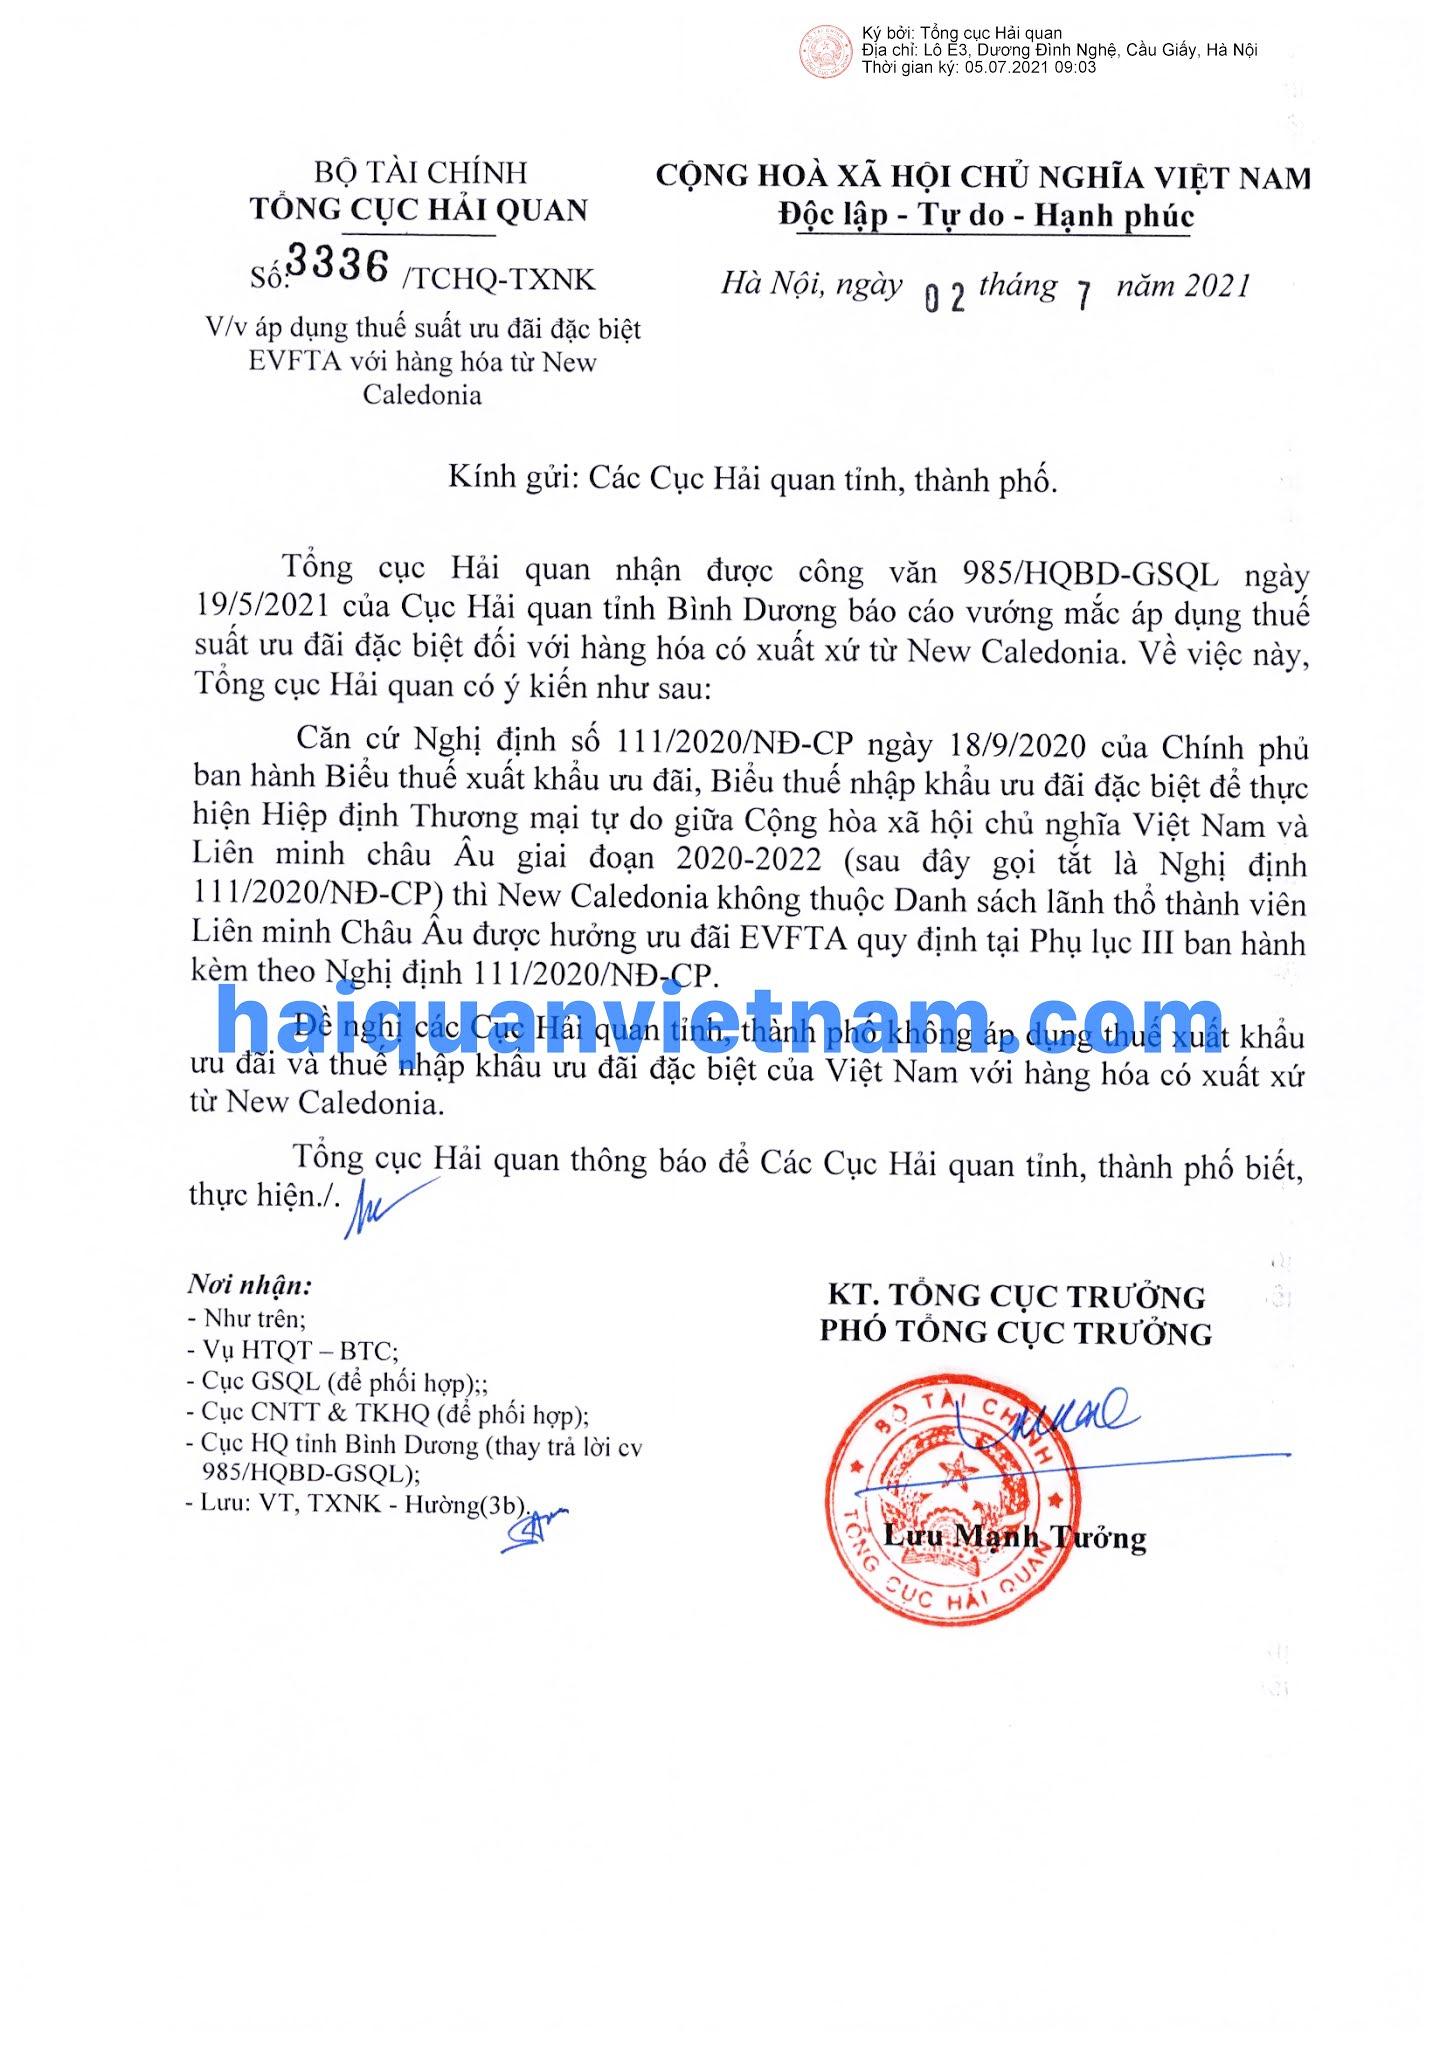 [Image: 210702-3336-TCHQ-TXNK_haiquanvietnam_01.jpg]